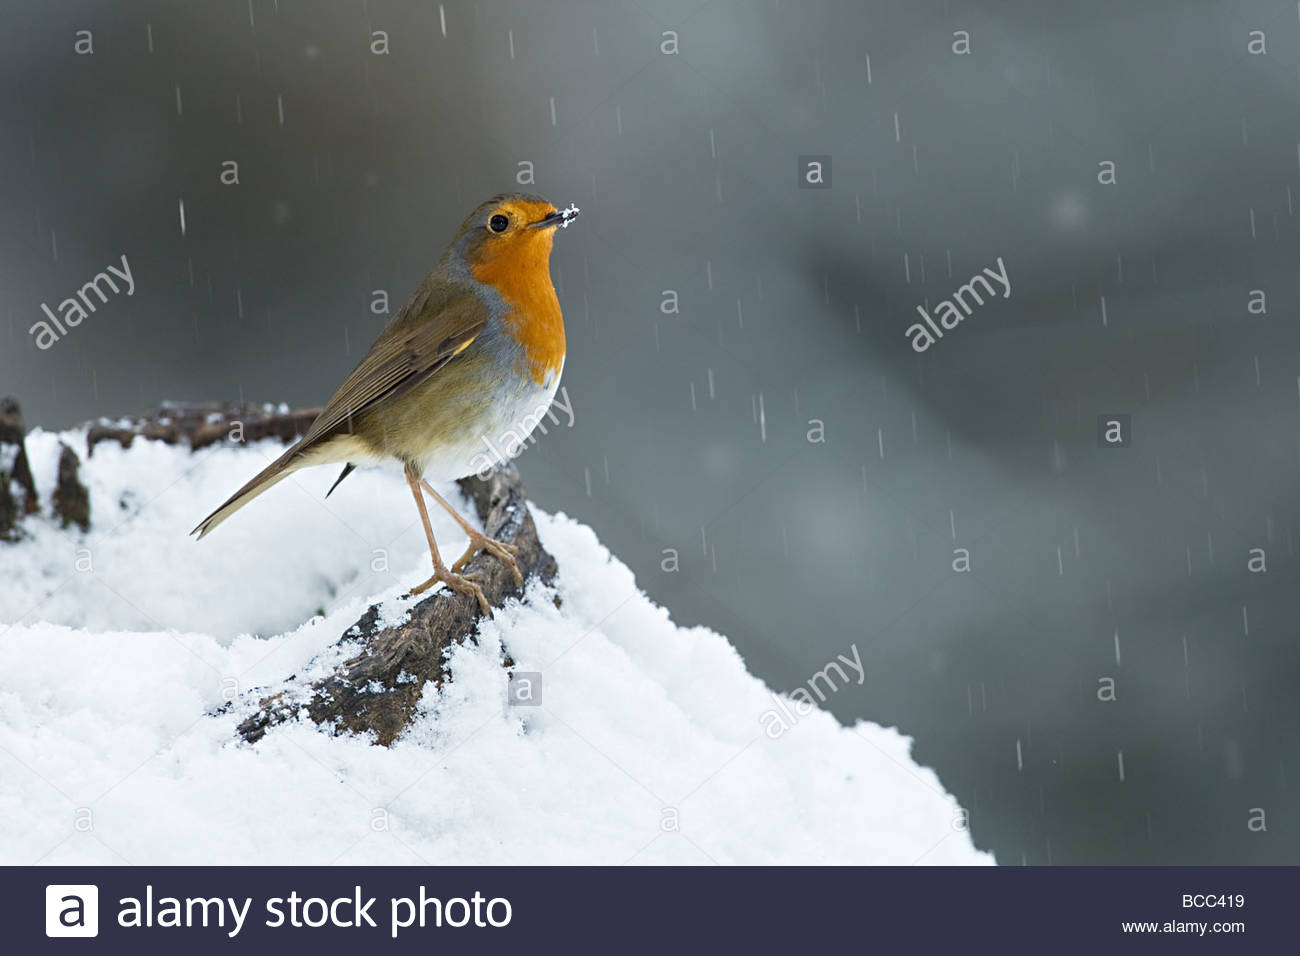 ROBIN IN SNOWFALL - Stock Image